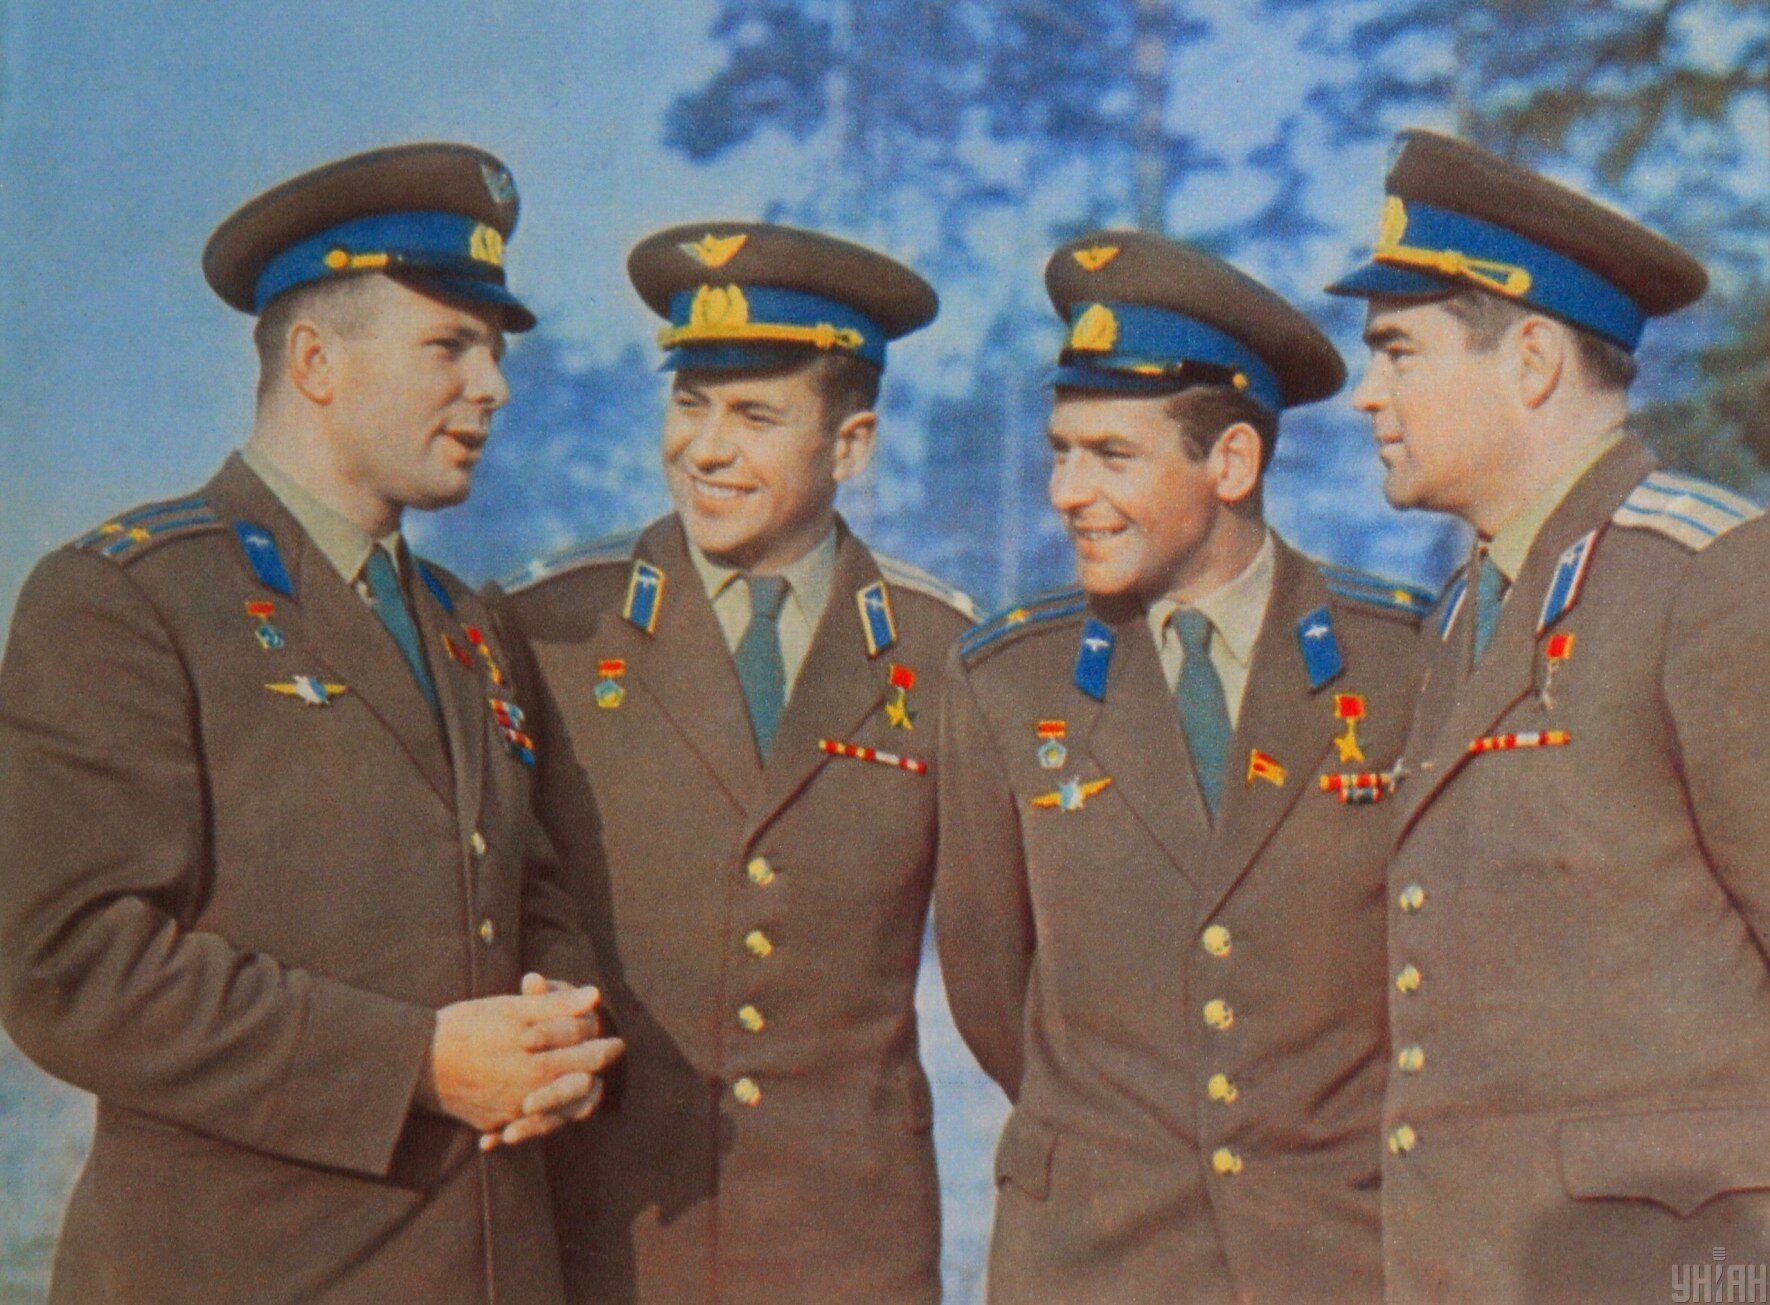 Юрий Гагарин, Павел Попович, Герман Титов, Андриан Николаев. Апрель 1963 года